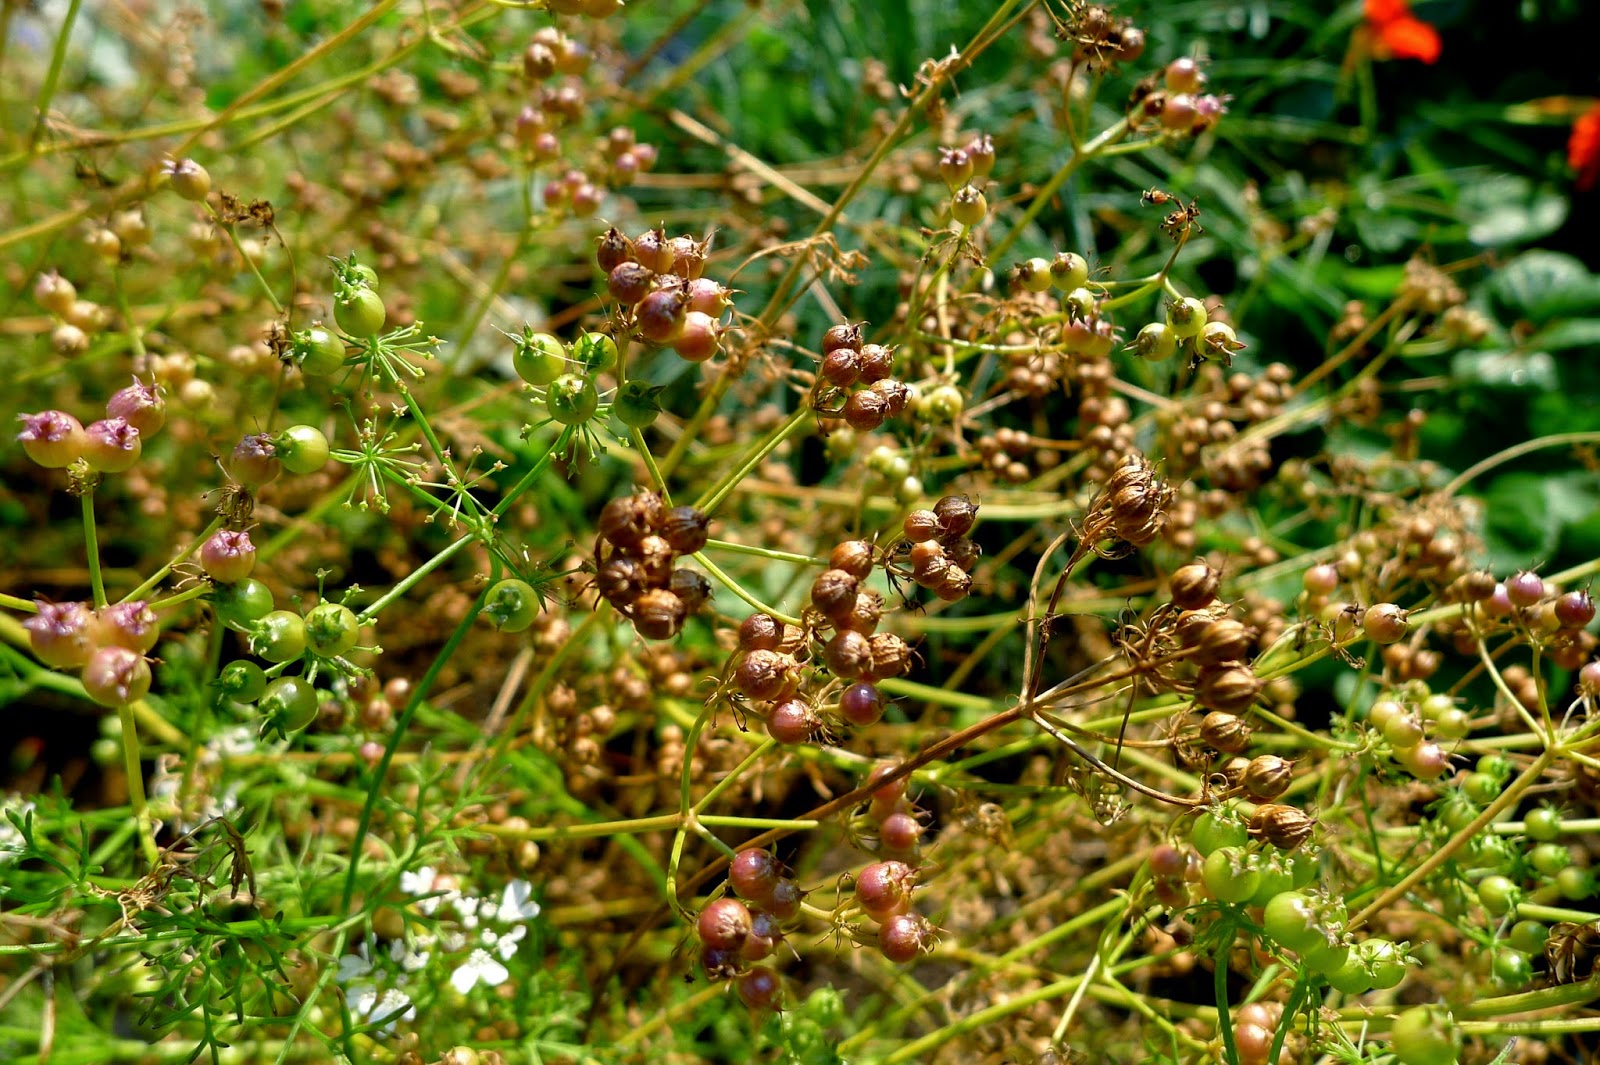 Coriander seeds, harvesting seeds